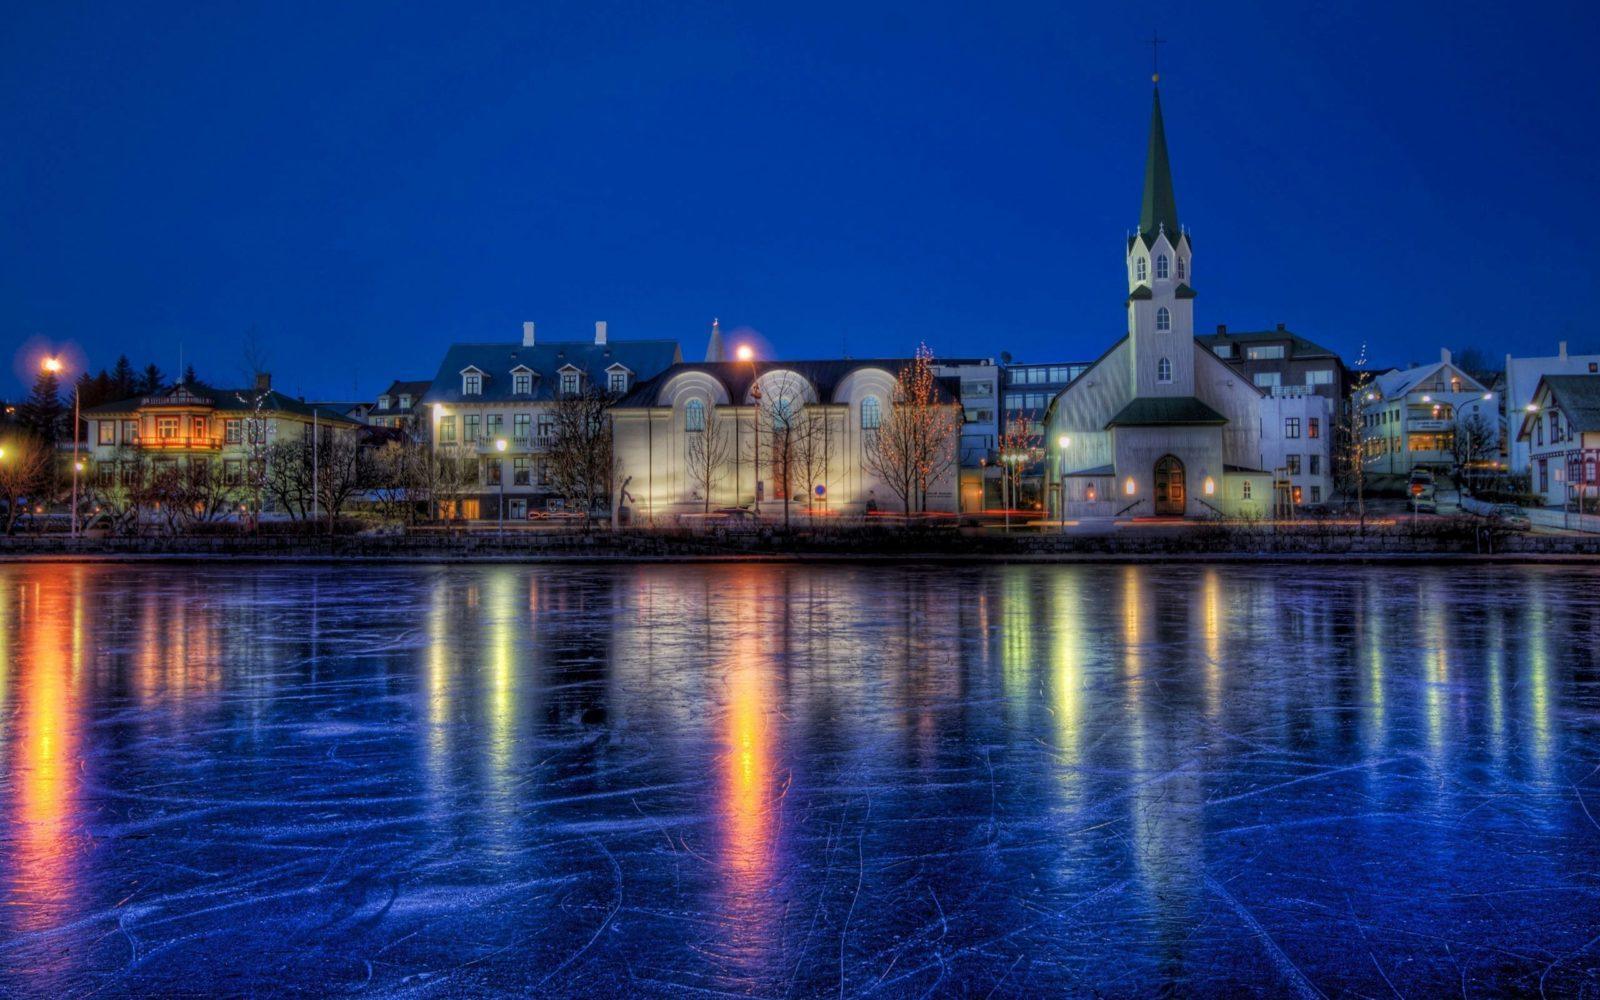 reykjavik - ავიაბილეთები რეიკიავიკი